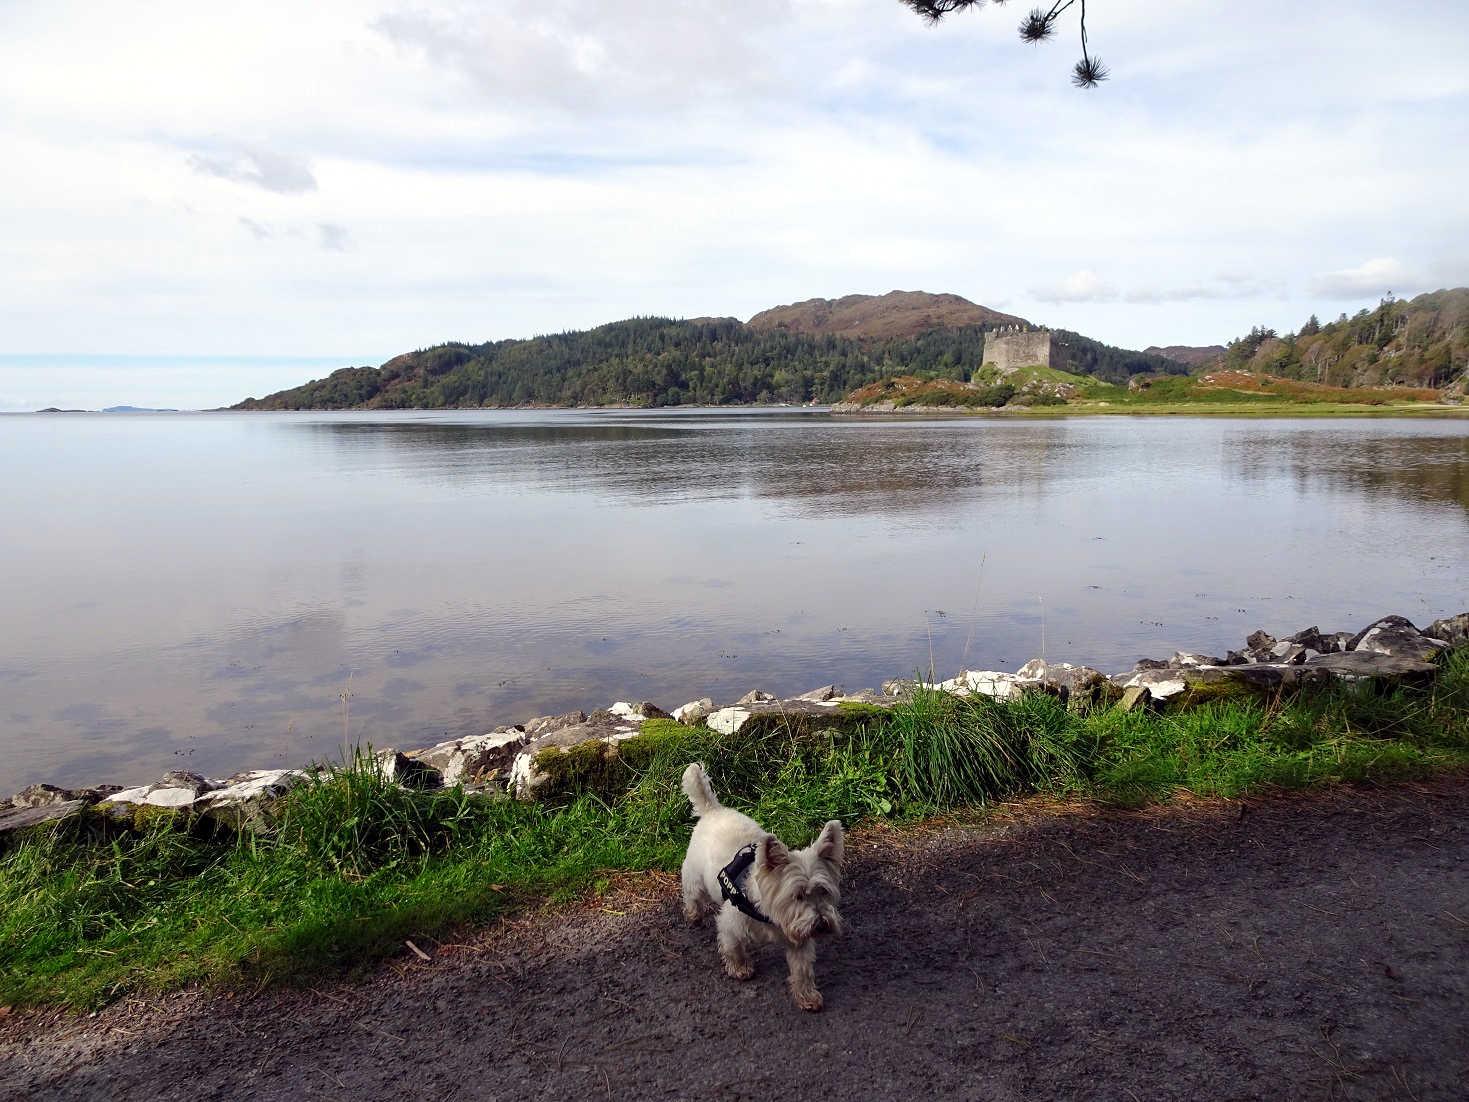 Poppy the westie at Loch Moidart